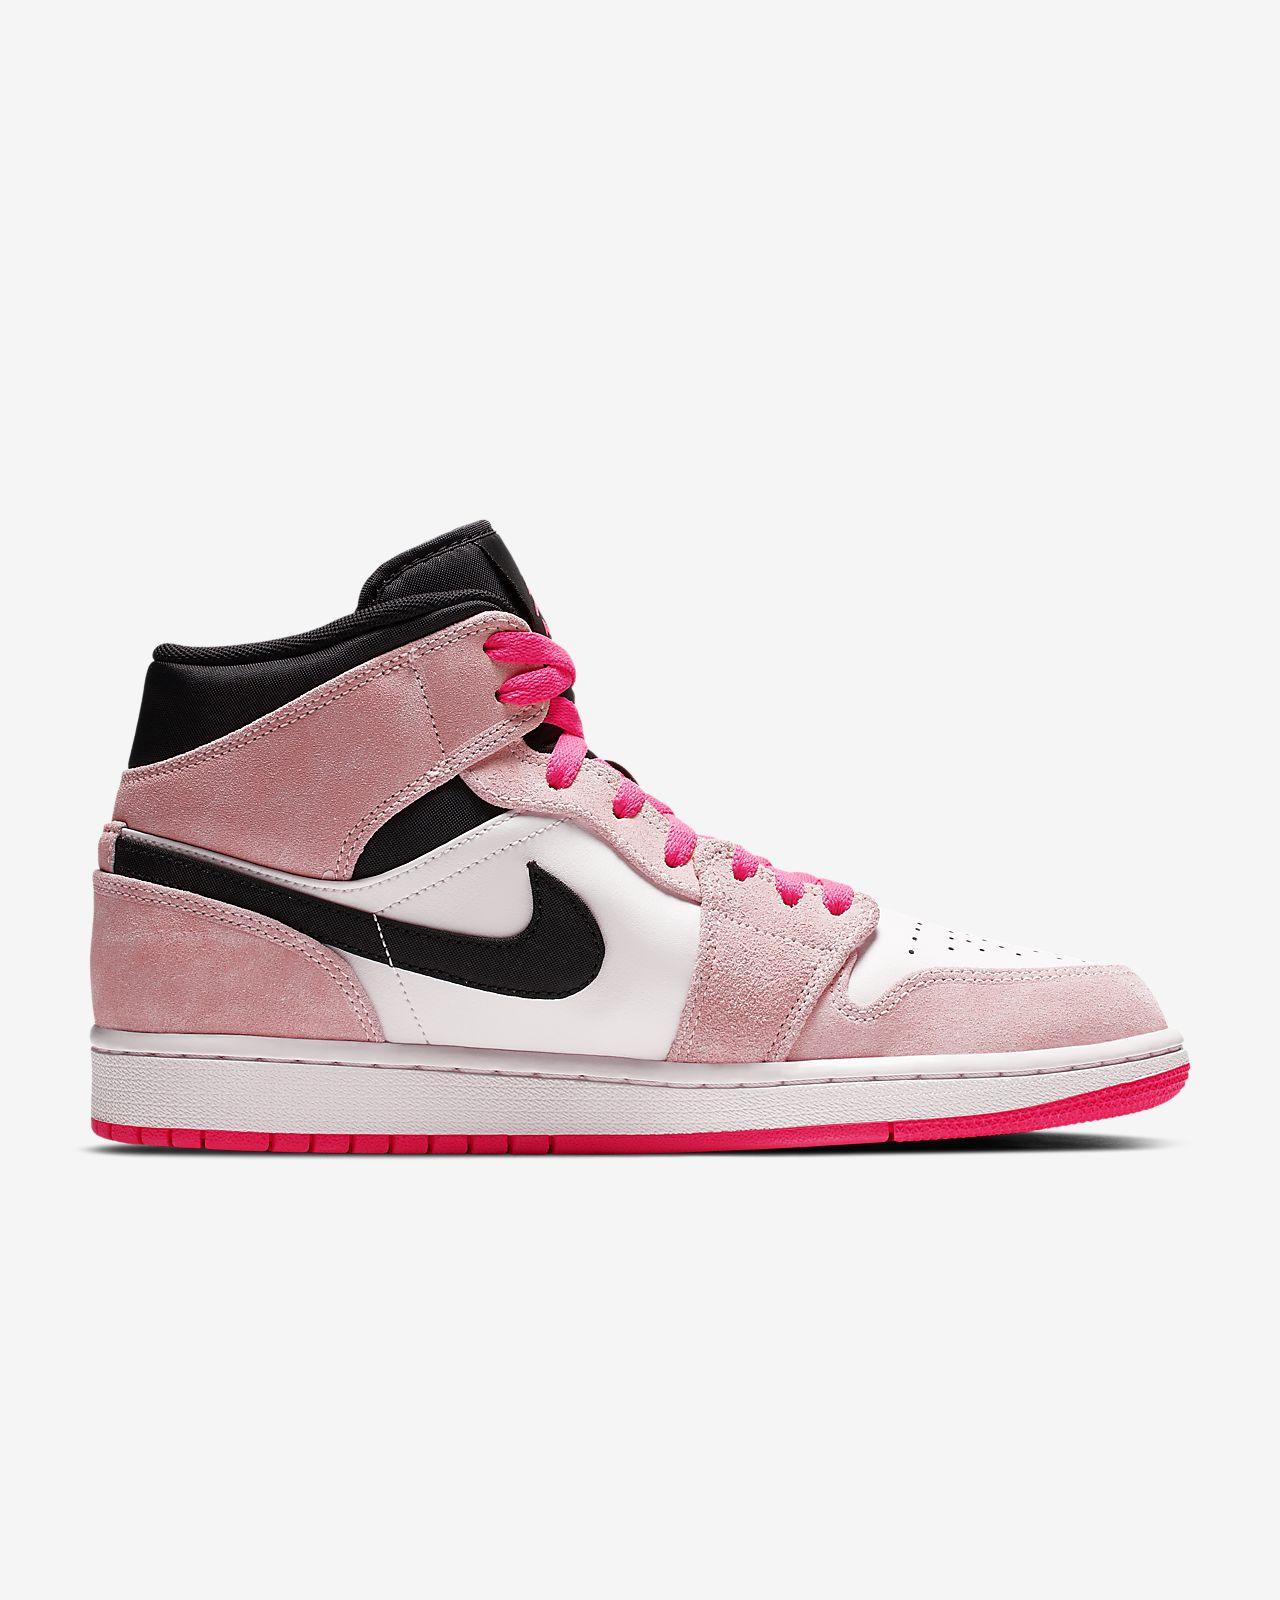 san francisco f0c81 796ed ... Air Jordan 1 Mid SE Men s Shoe